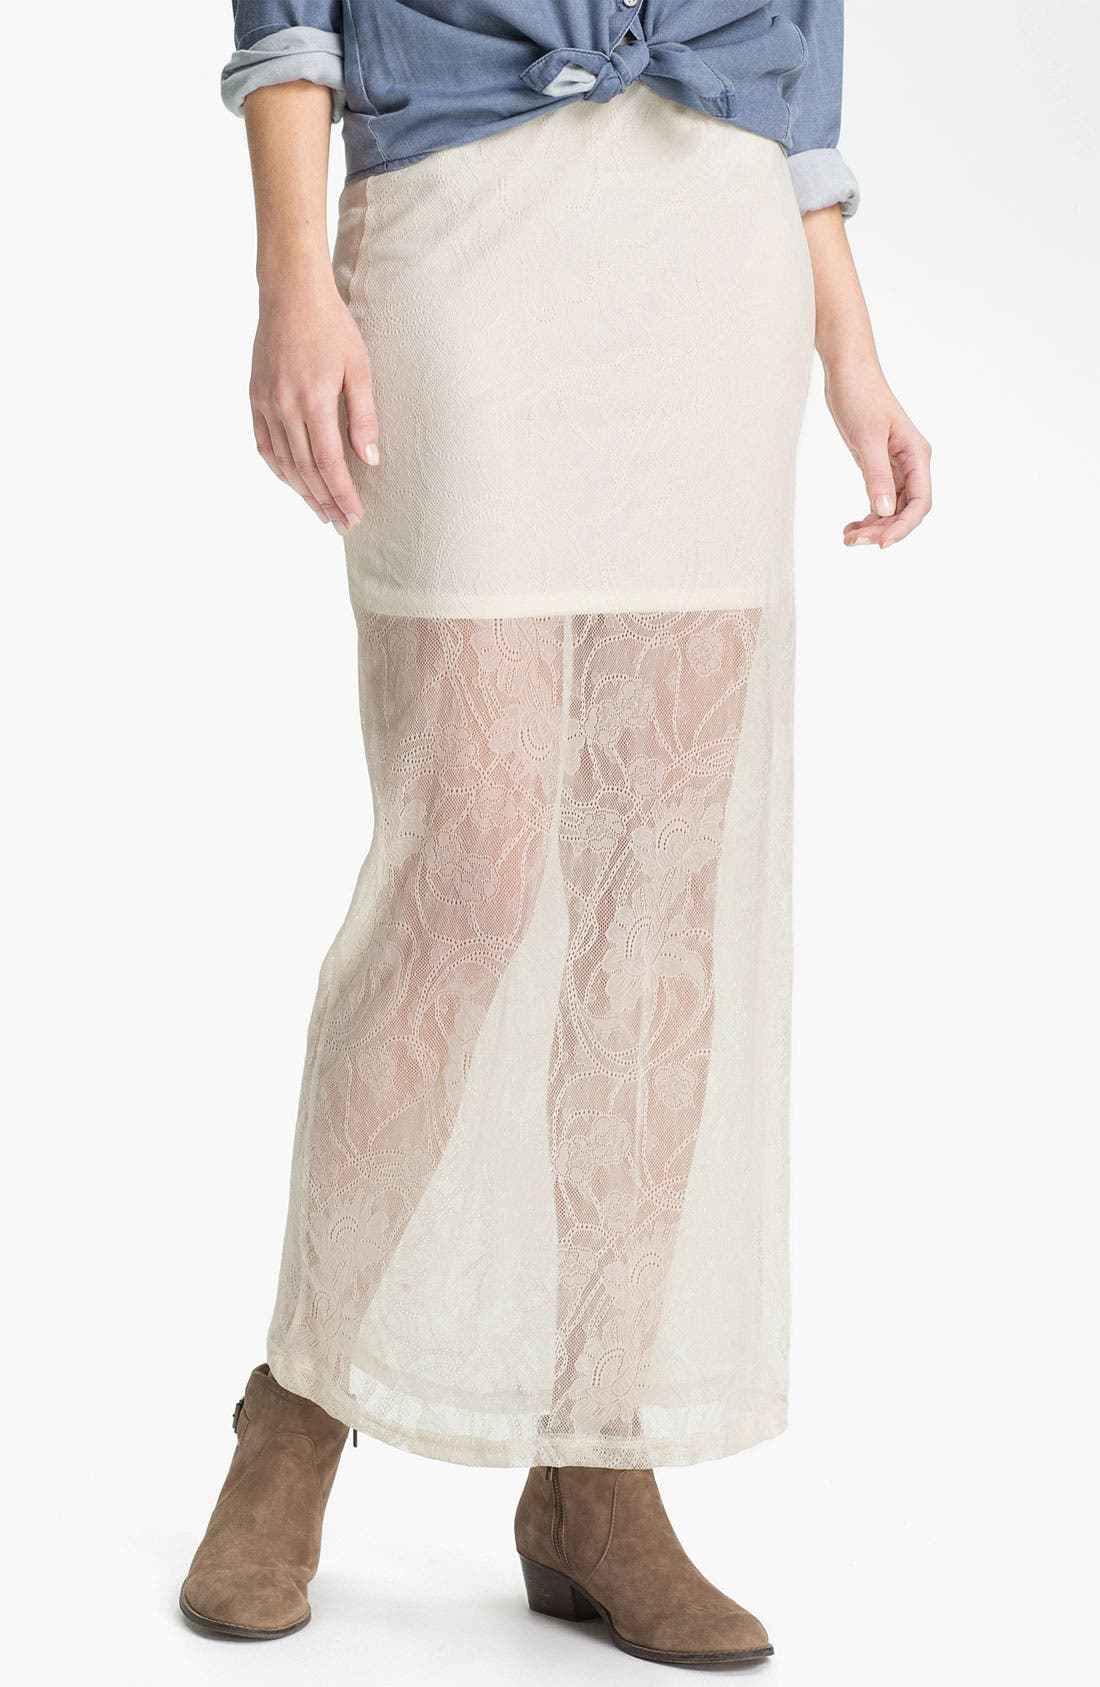 Alternate Image 1 Selected - h.i.p. Half Sheer Lace Maxi Skirt (Juniors)